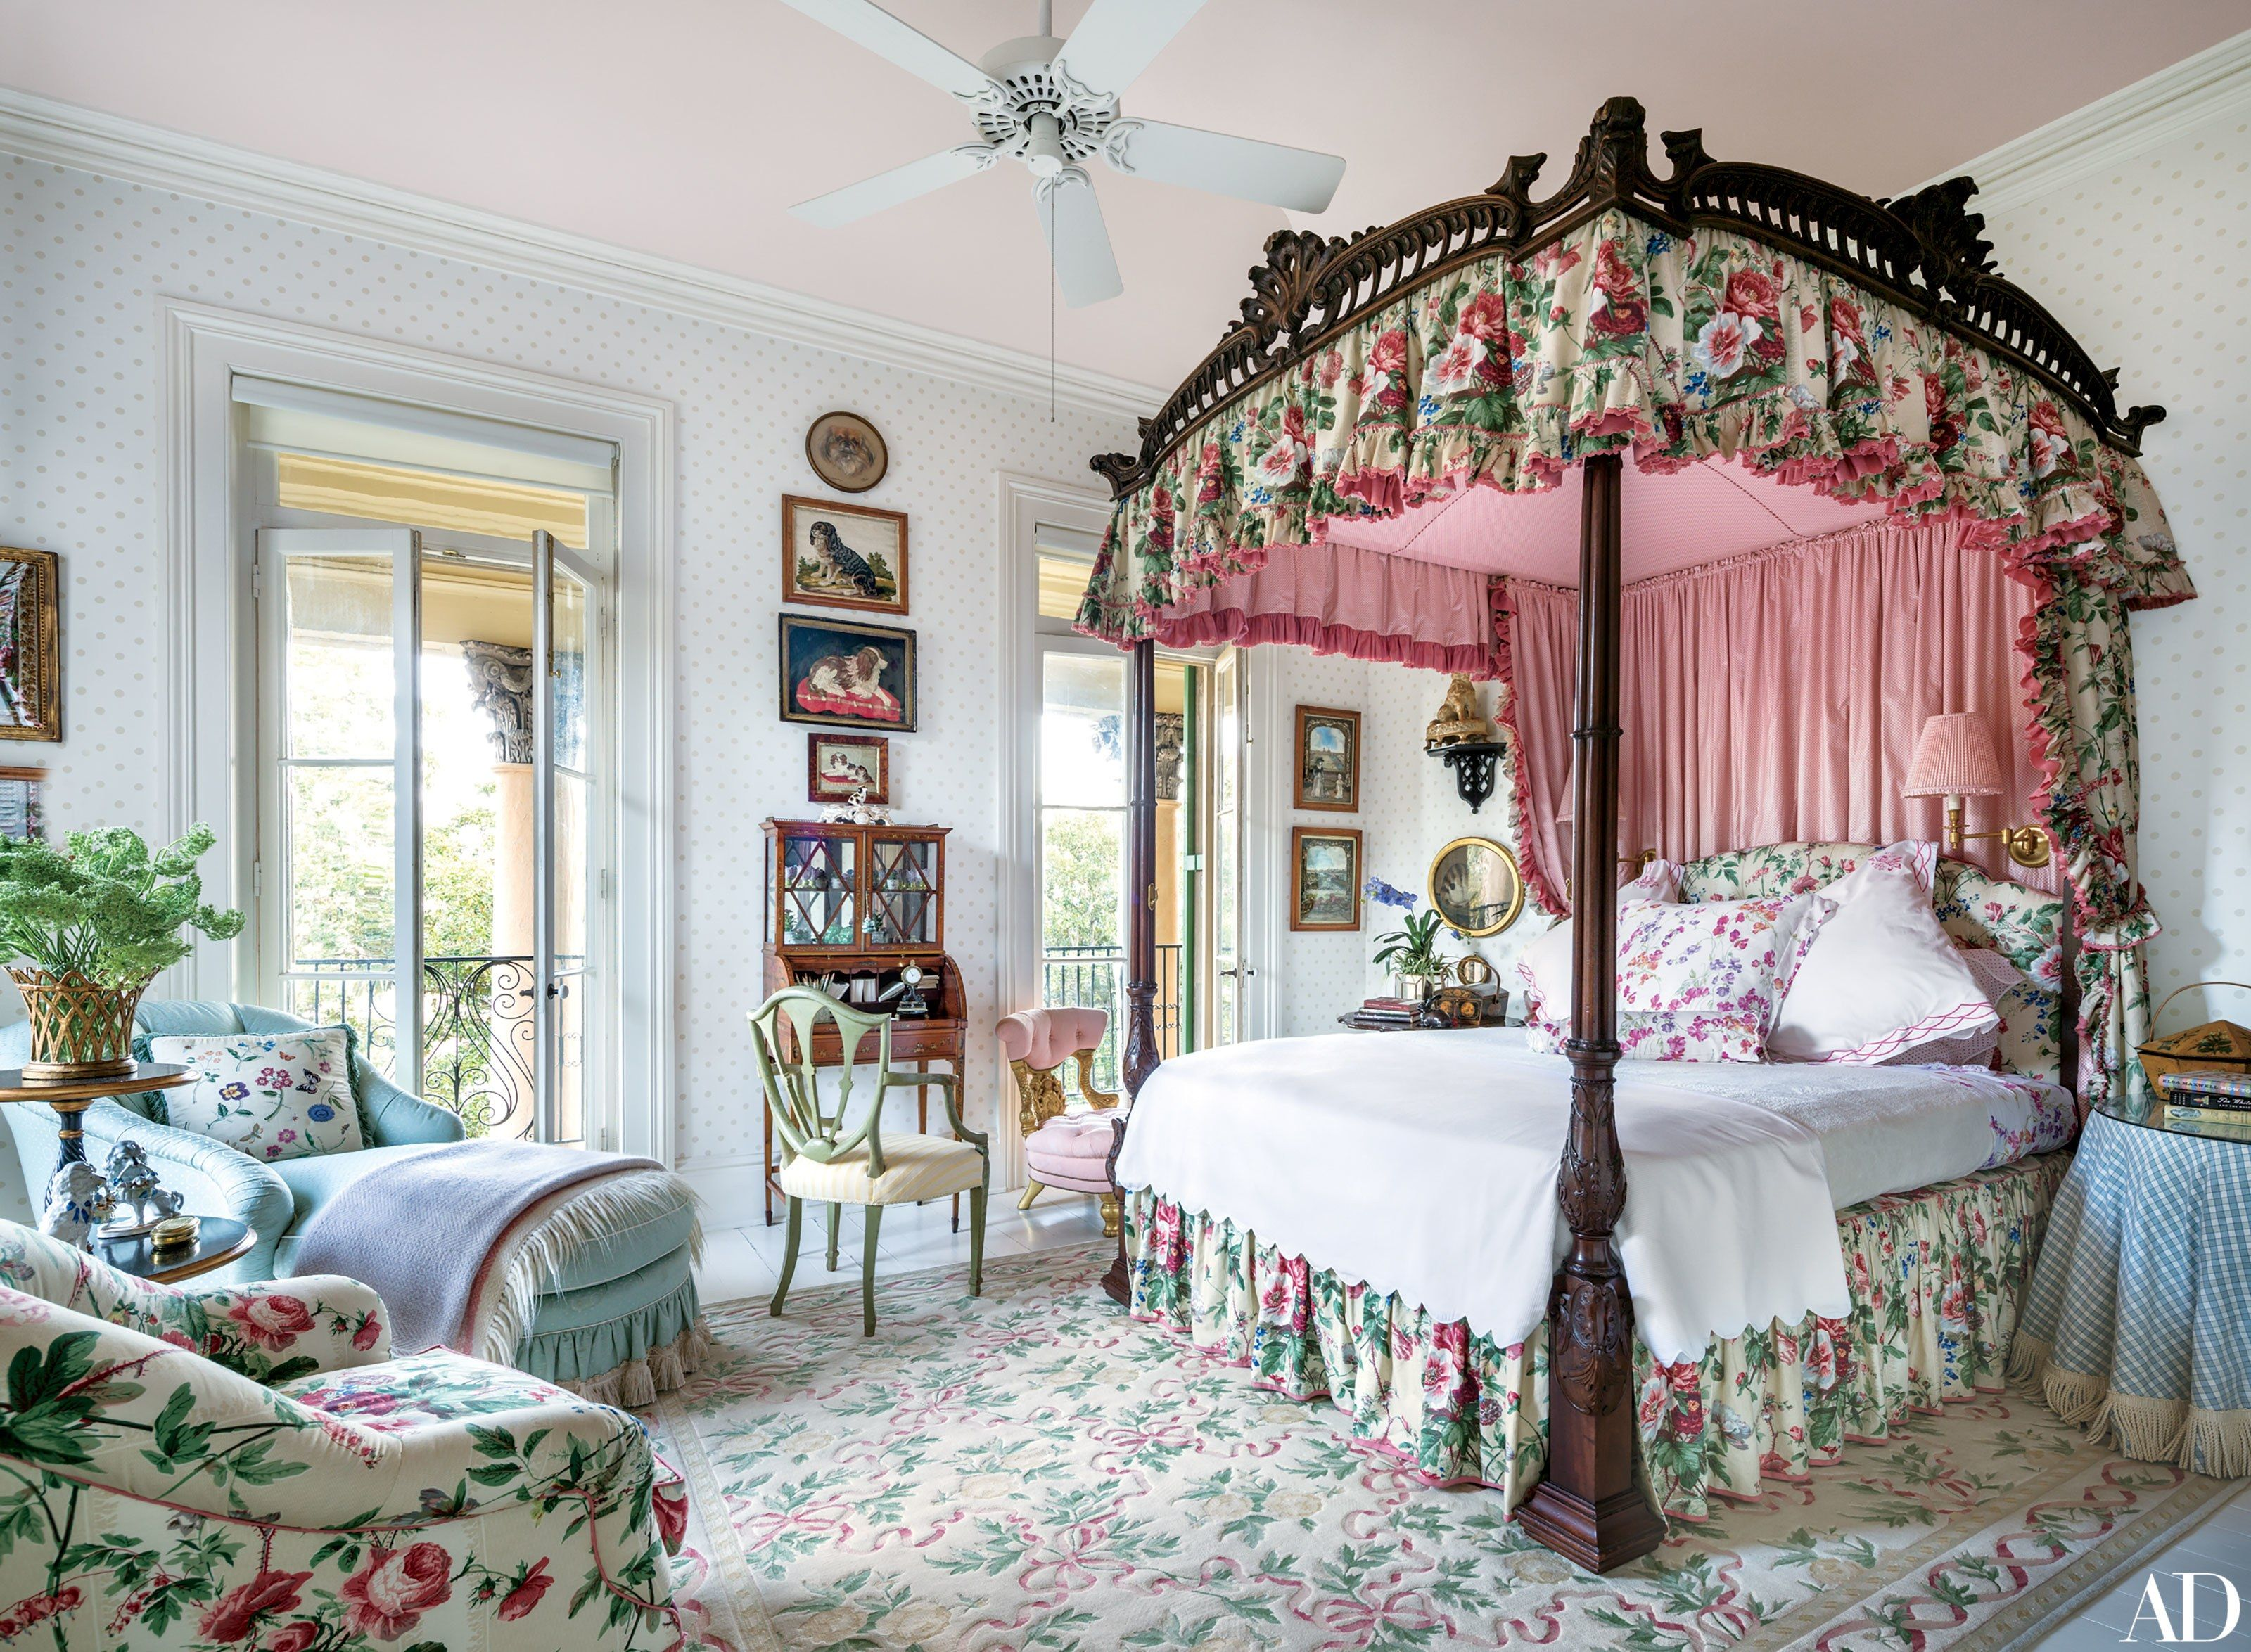 Socialite Patricia Altschul s 1850s South Carolina Mansion s